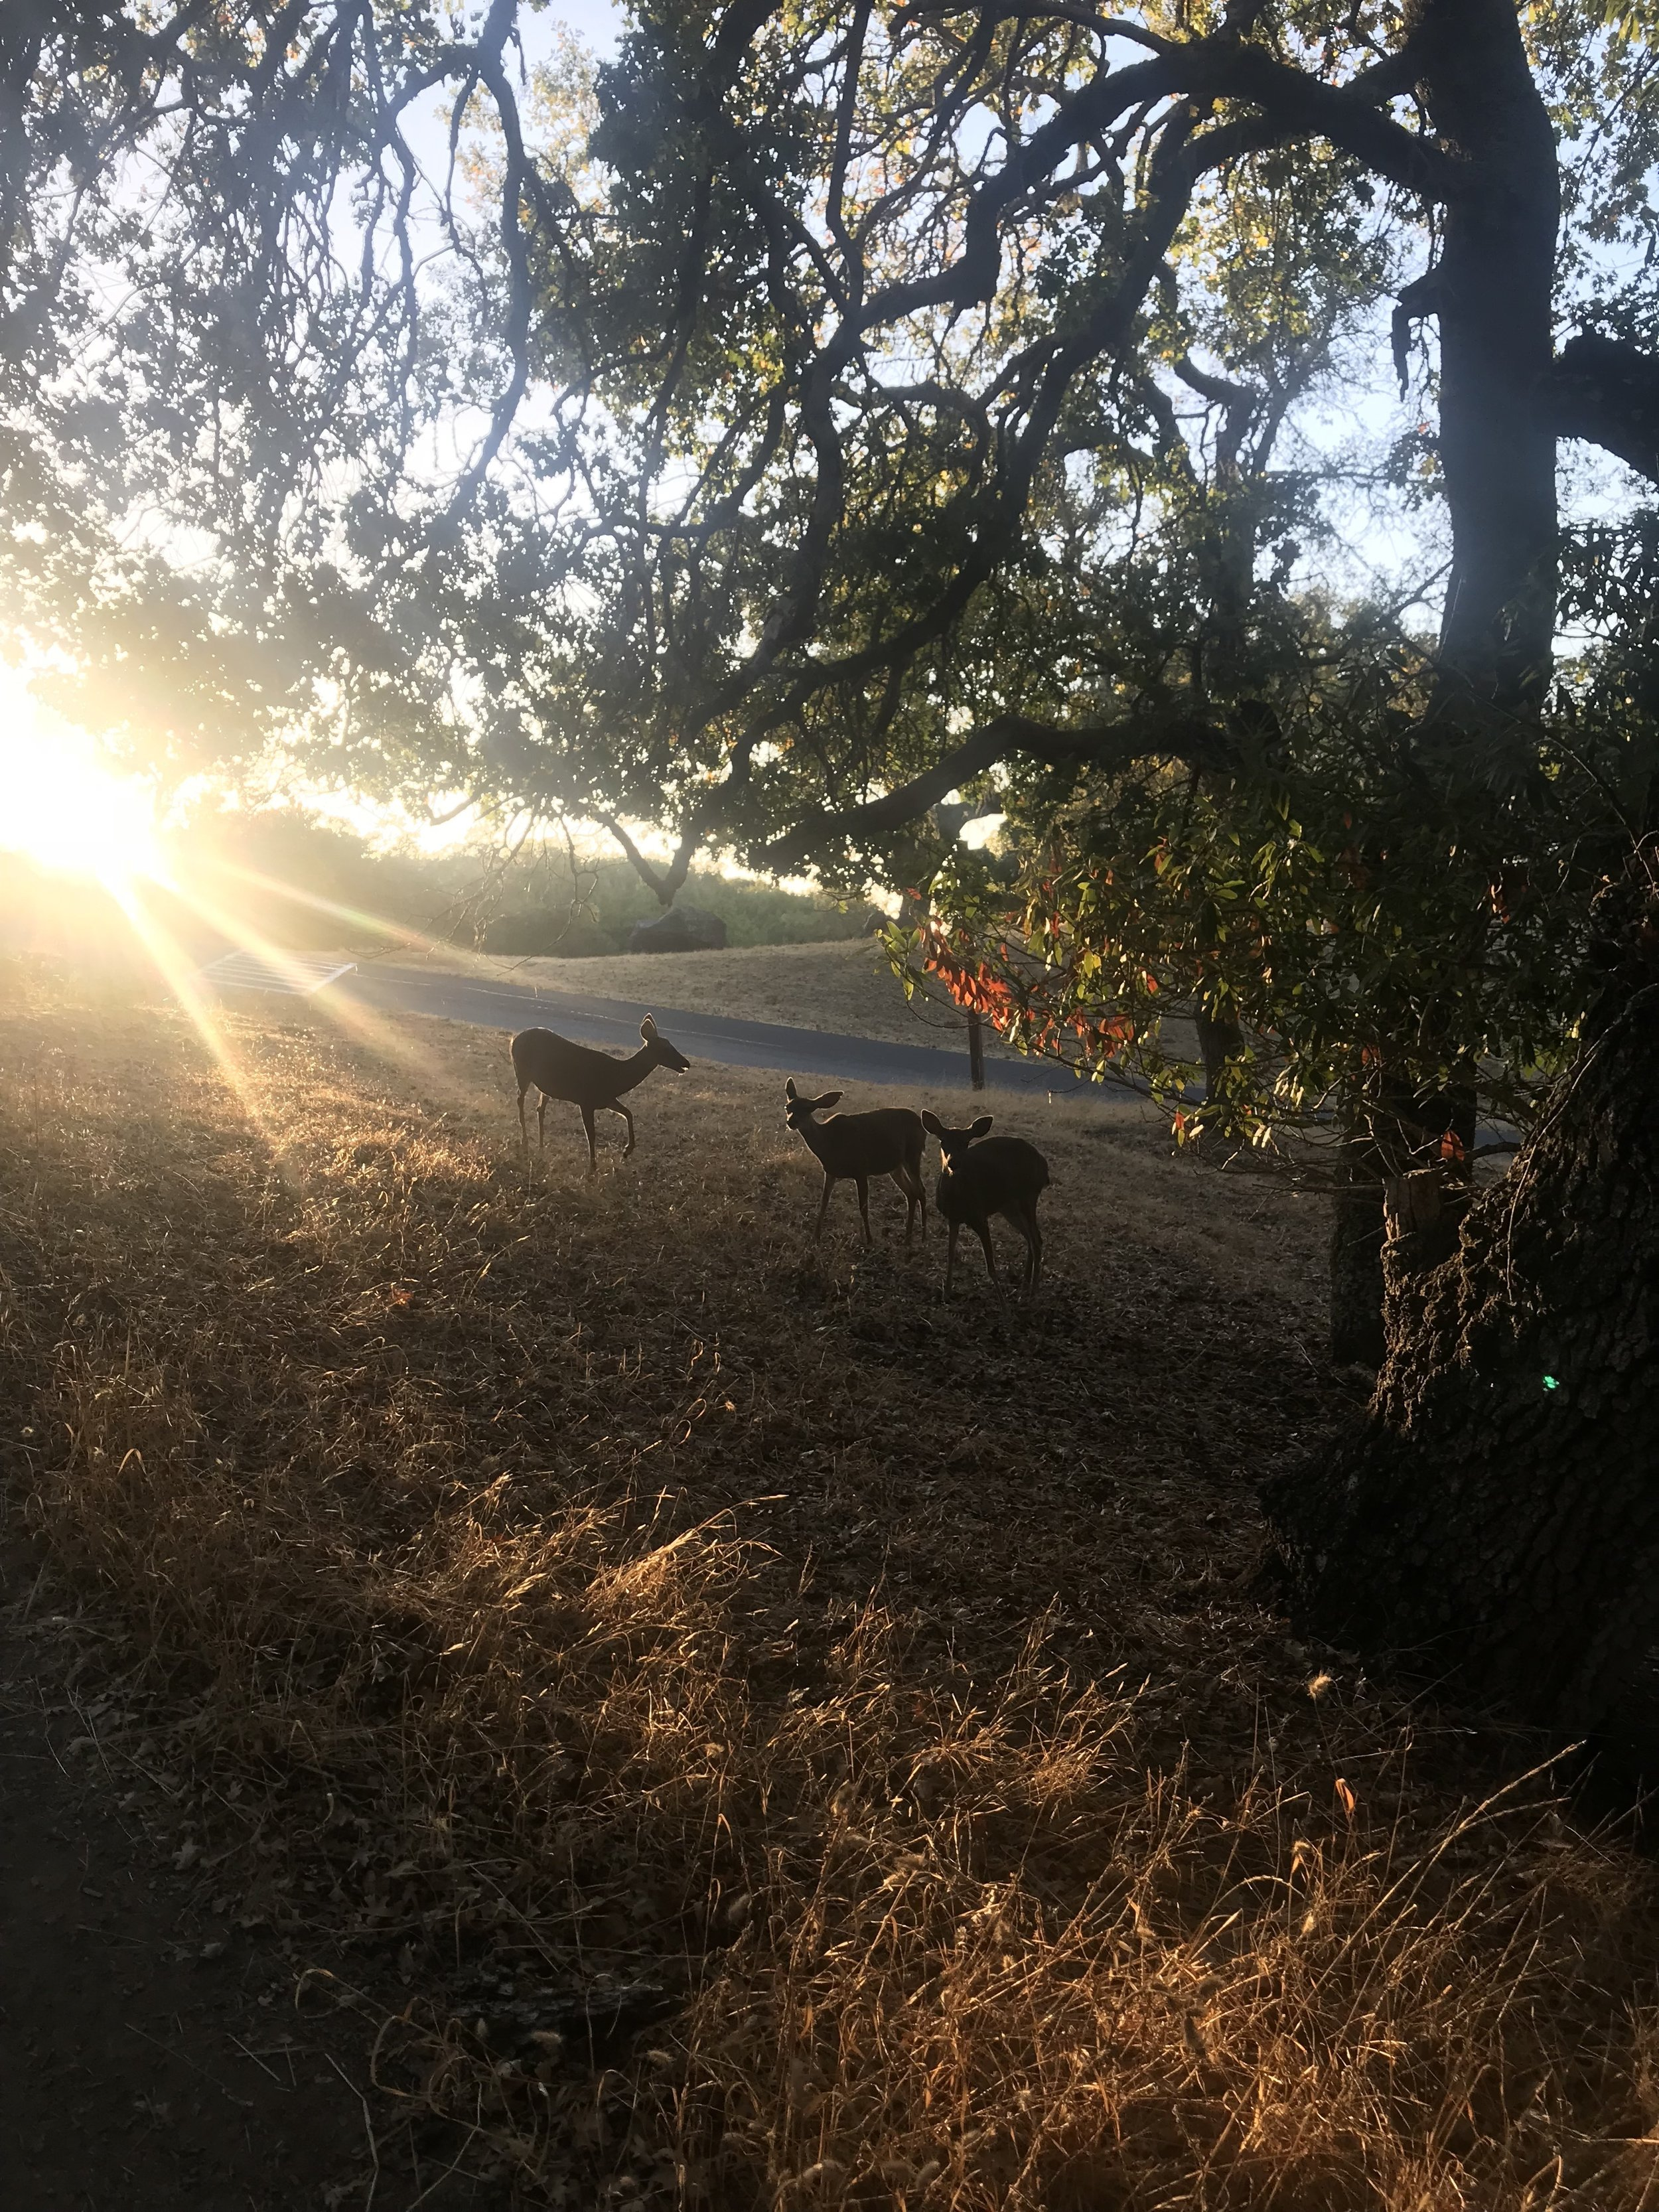 Biology retreat 2018. Deer at sunset. - 21 September 18